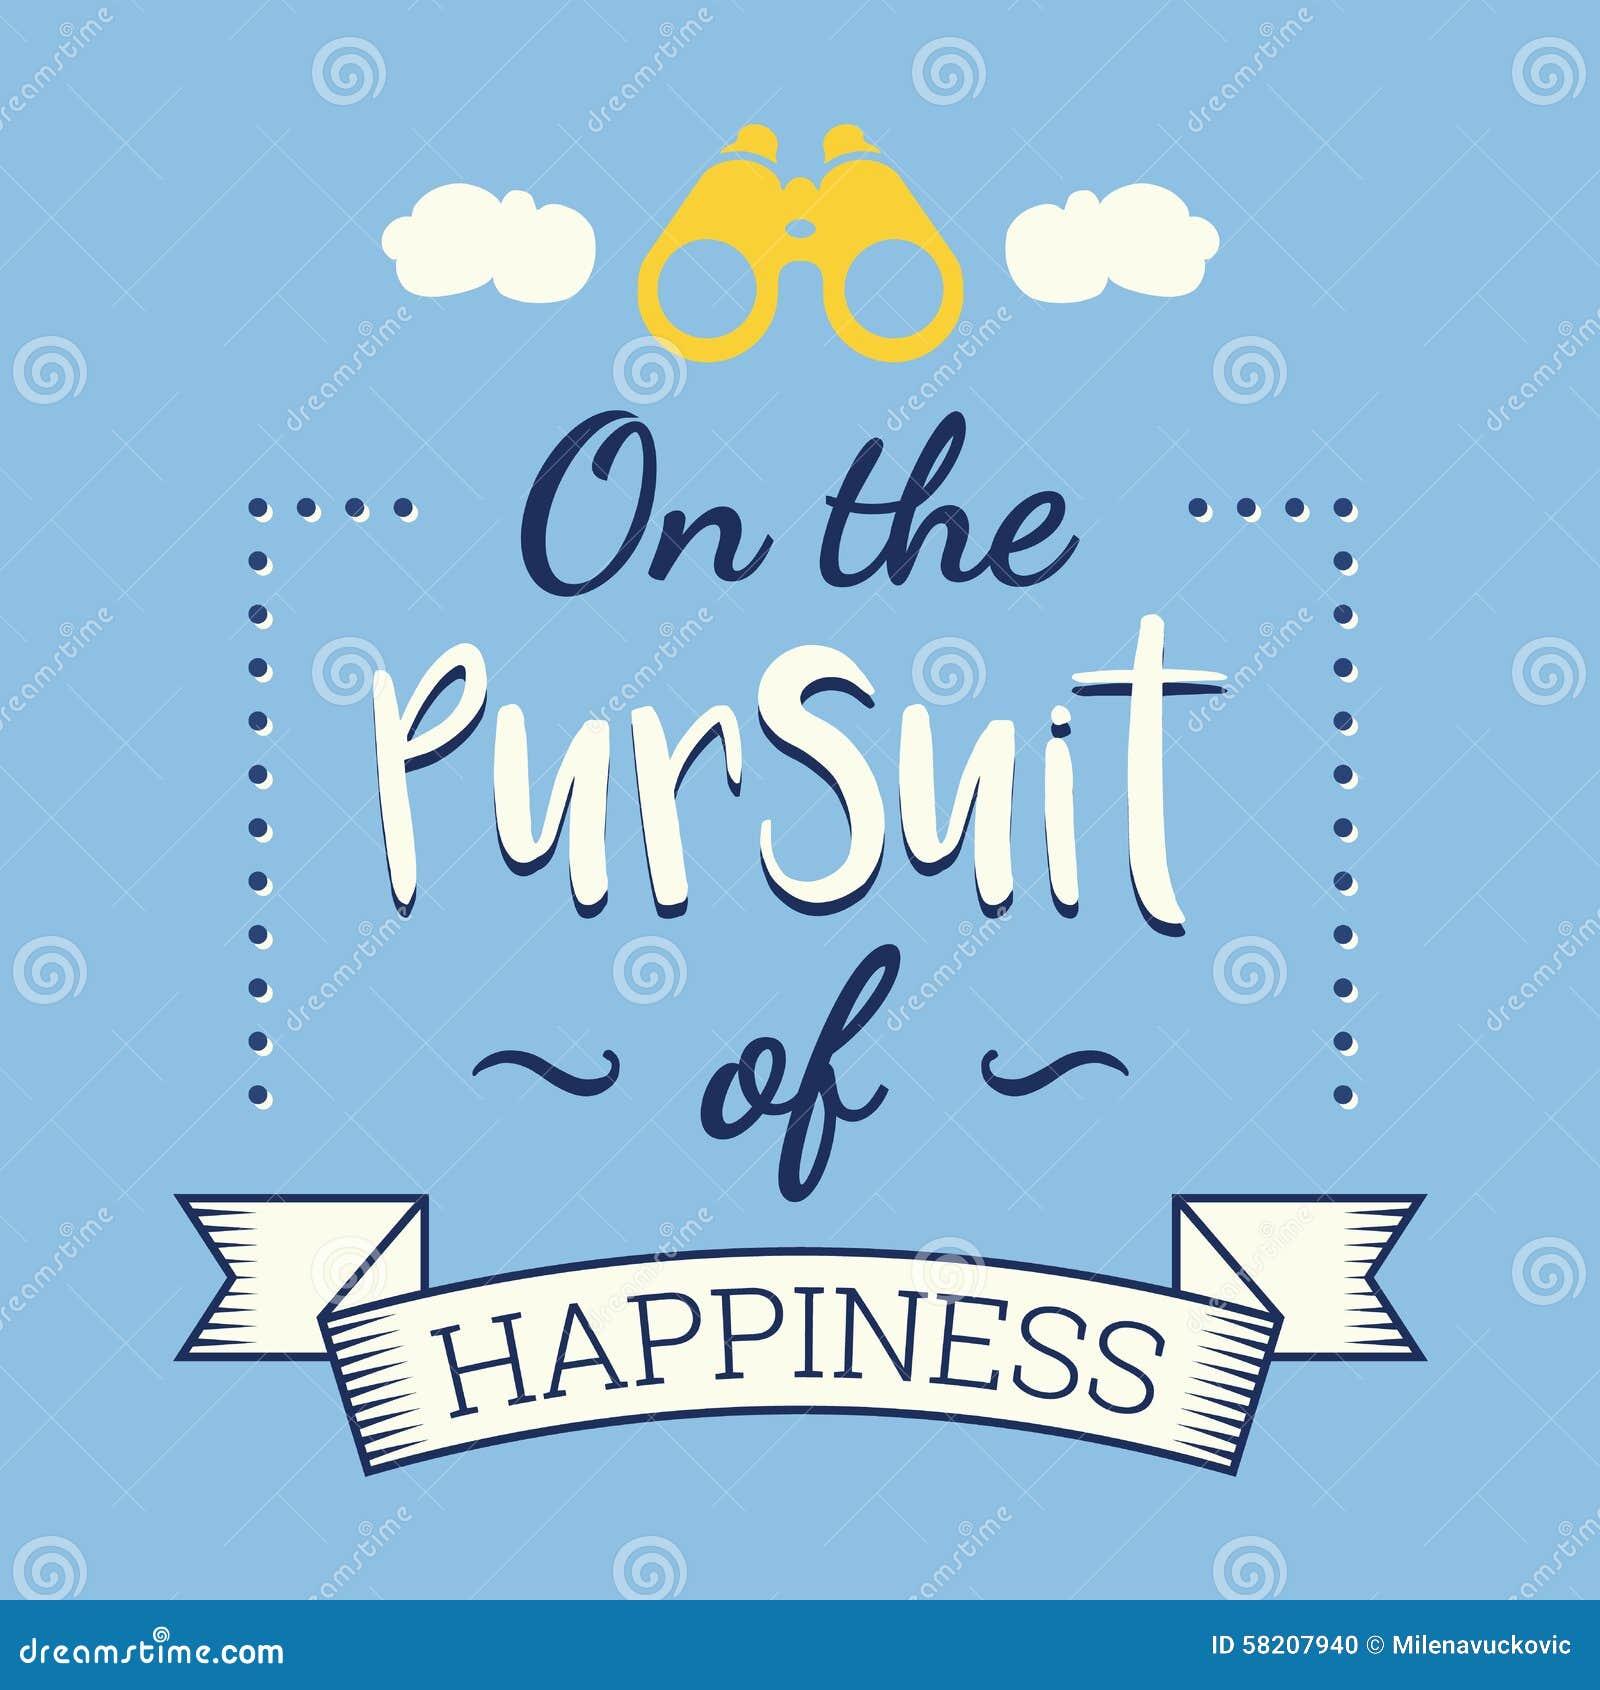 pursuit of happyness belonging essay